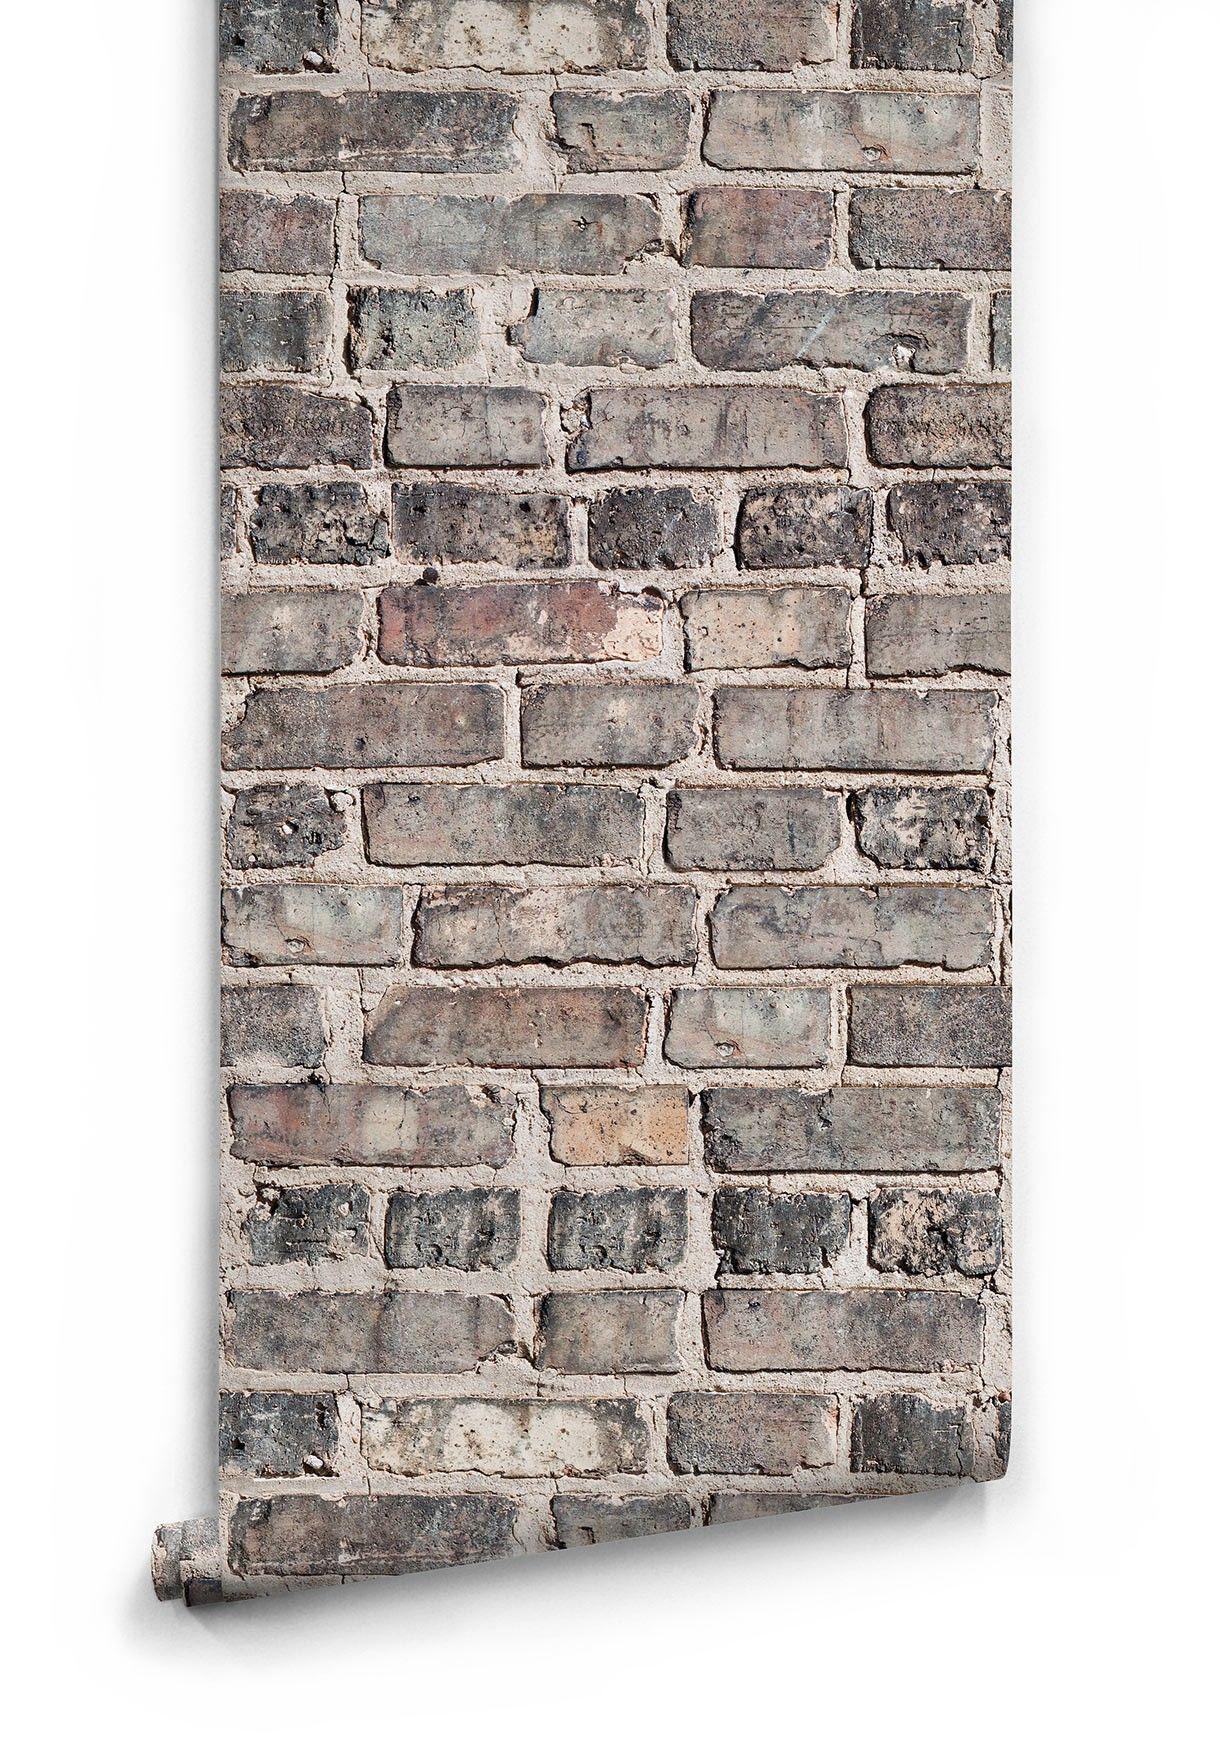 Vintage Bricks Wallpaper Realistic Authentic Brick Wallpaper White Brick Wallpaper Exposed Brick Wallpaper